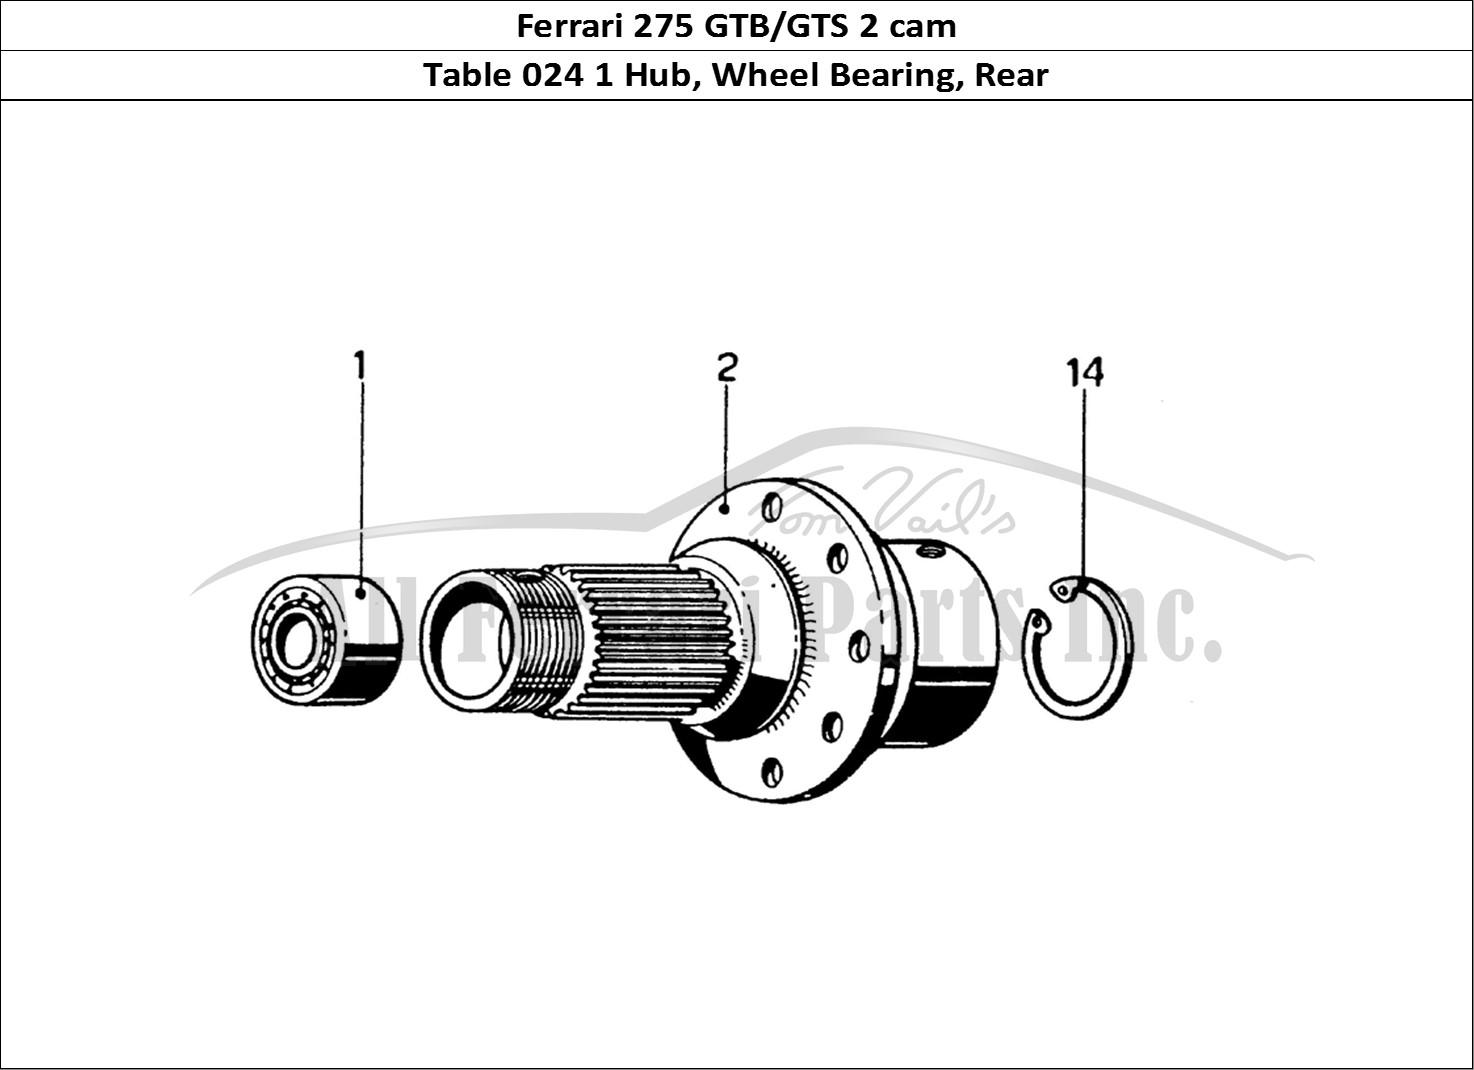 hight resolution of ferrari 275 gtb gts 2 cam mechanical table 024 1 hub wheel bearing rear